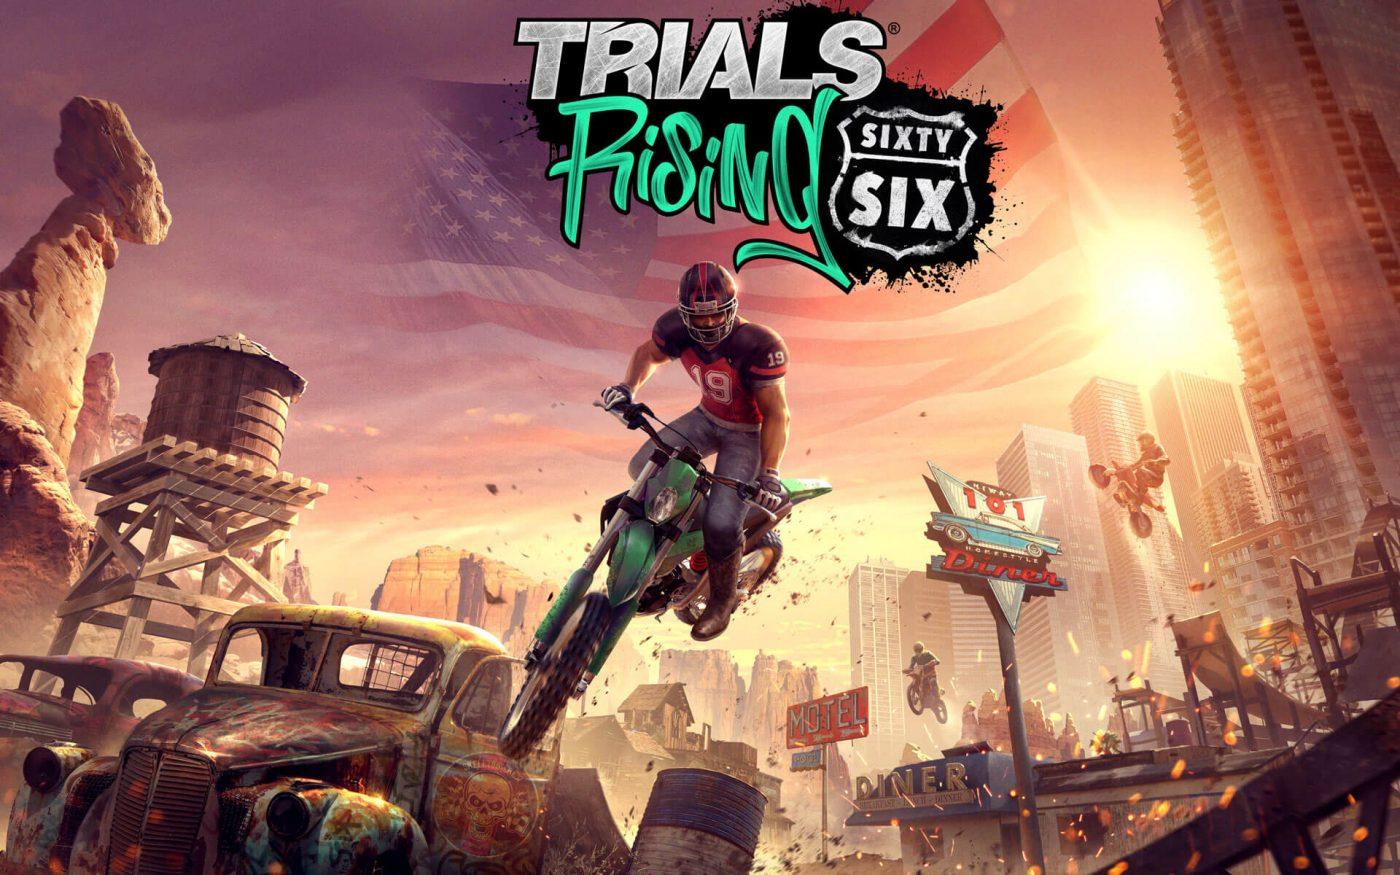 Trials Rising Sixty Six